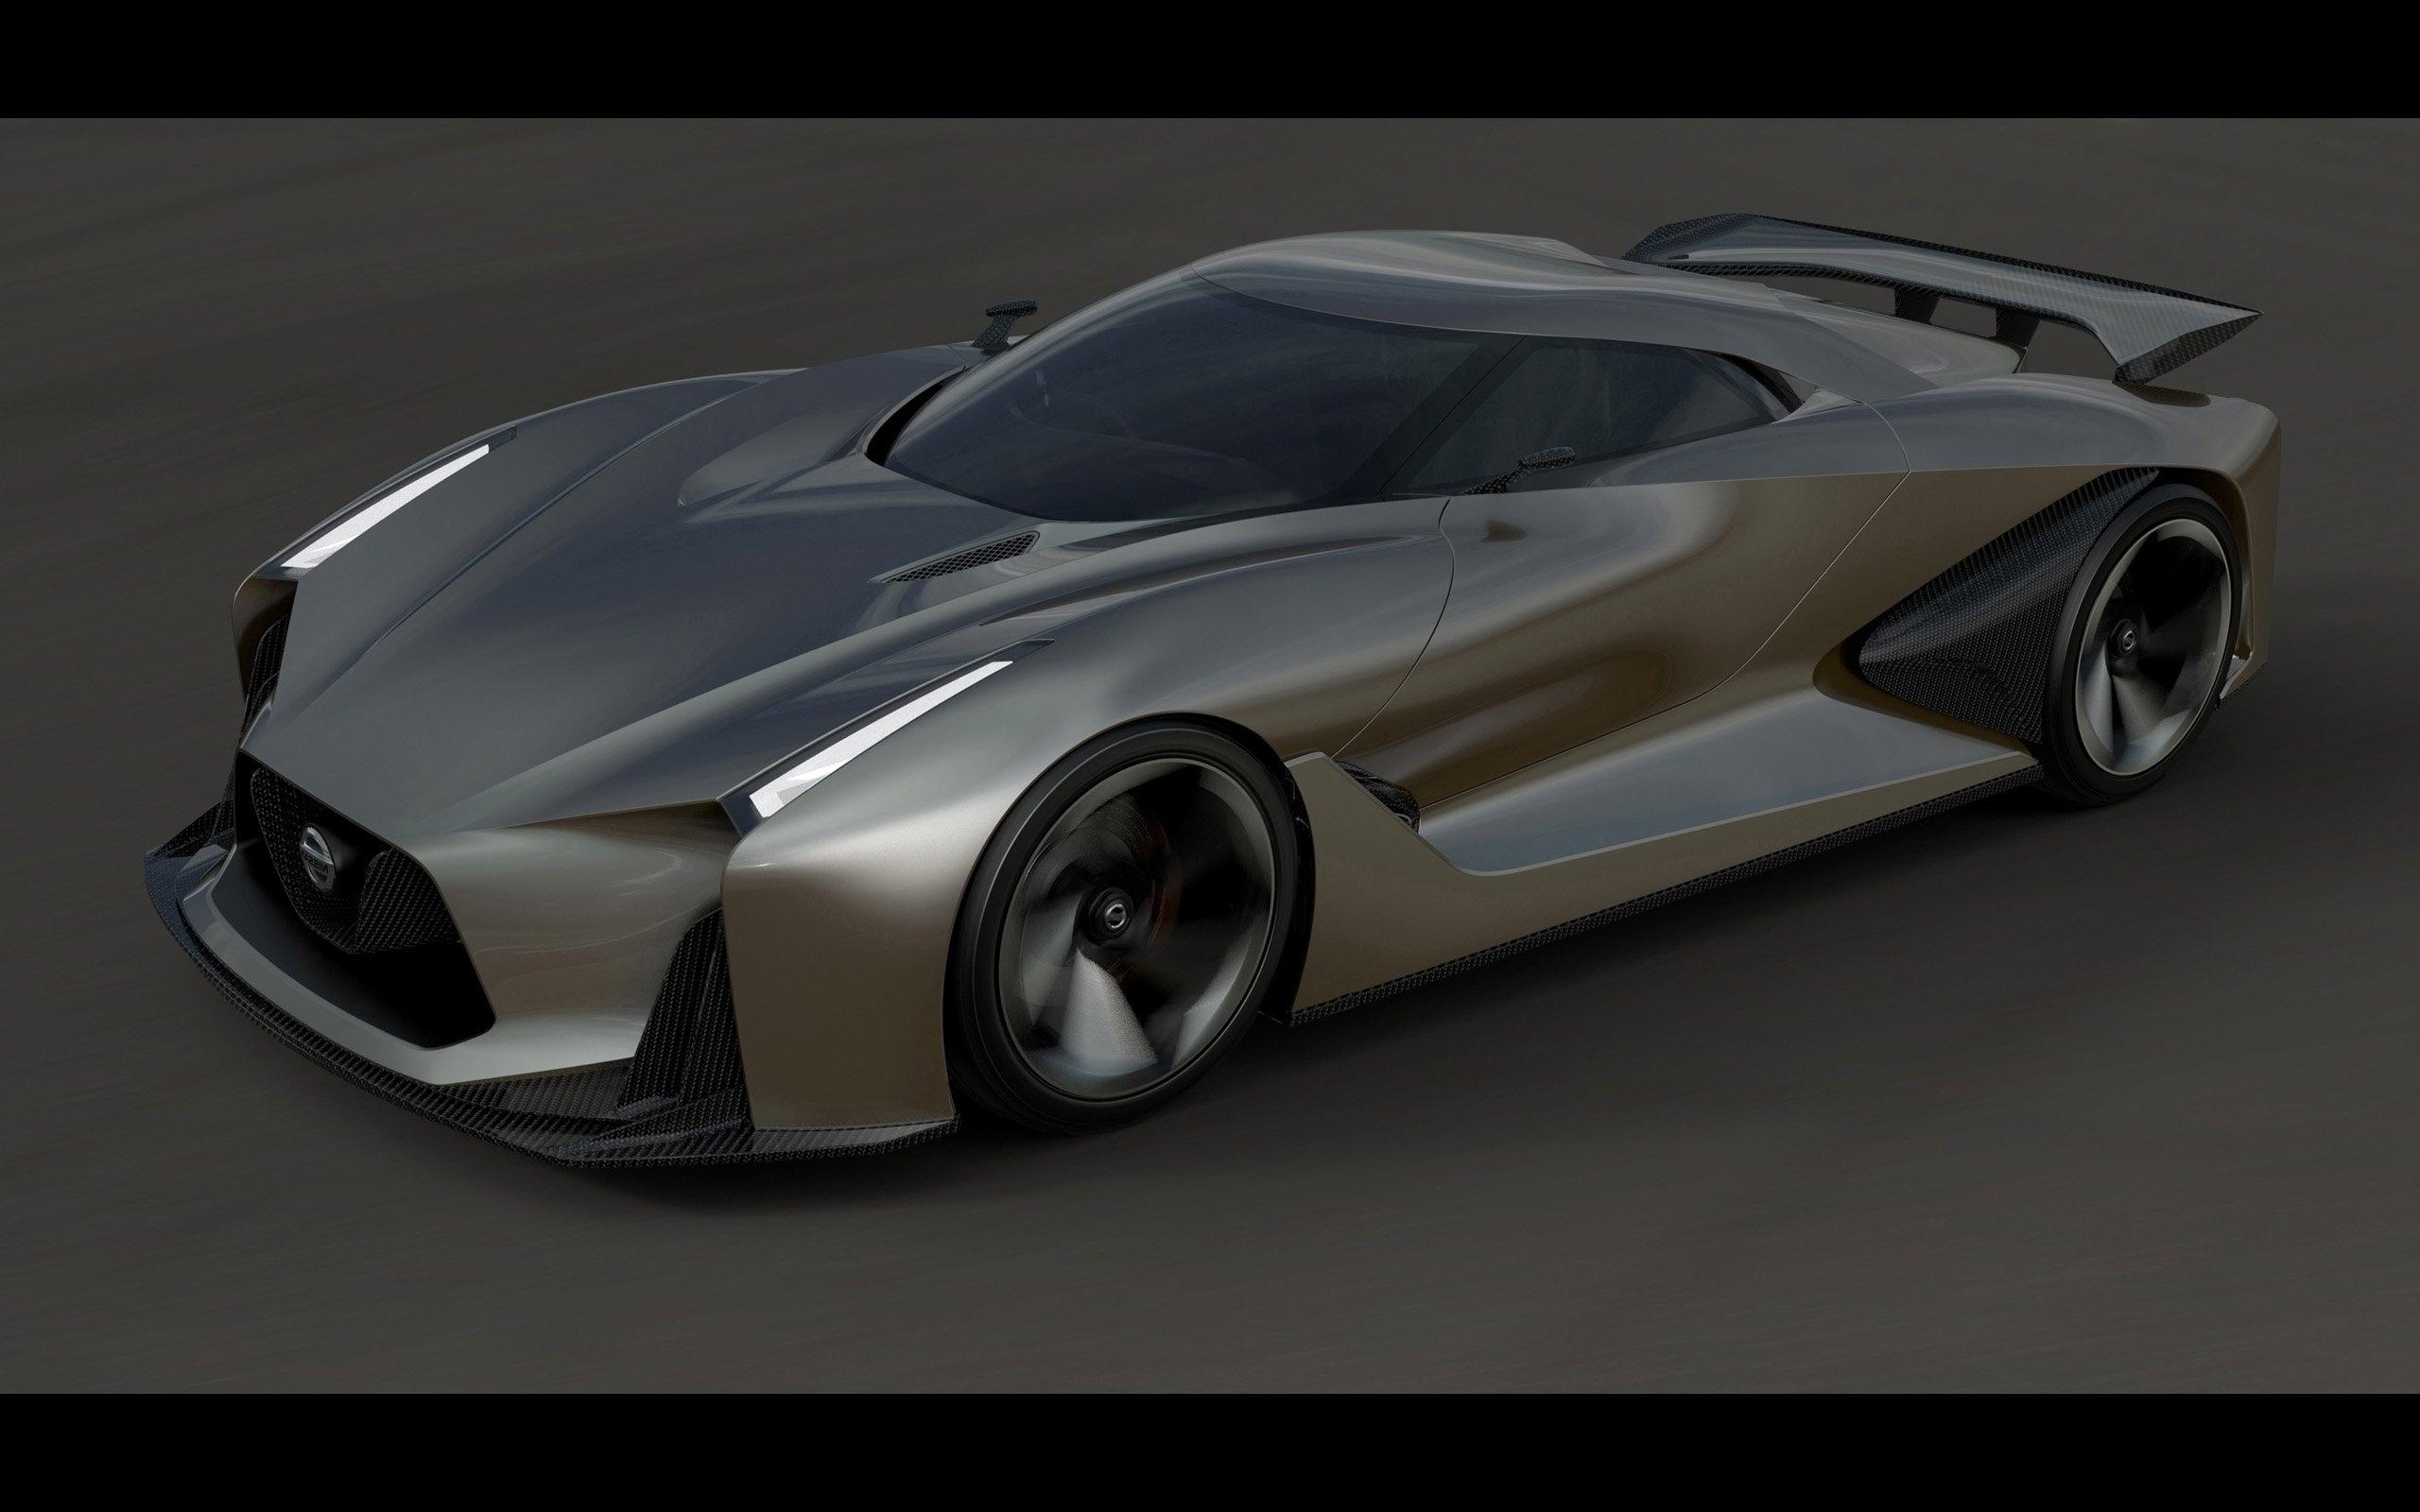 2014 Nissan Concept 2020 Vision Gran Turismo supercar d ...